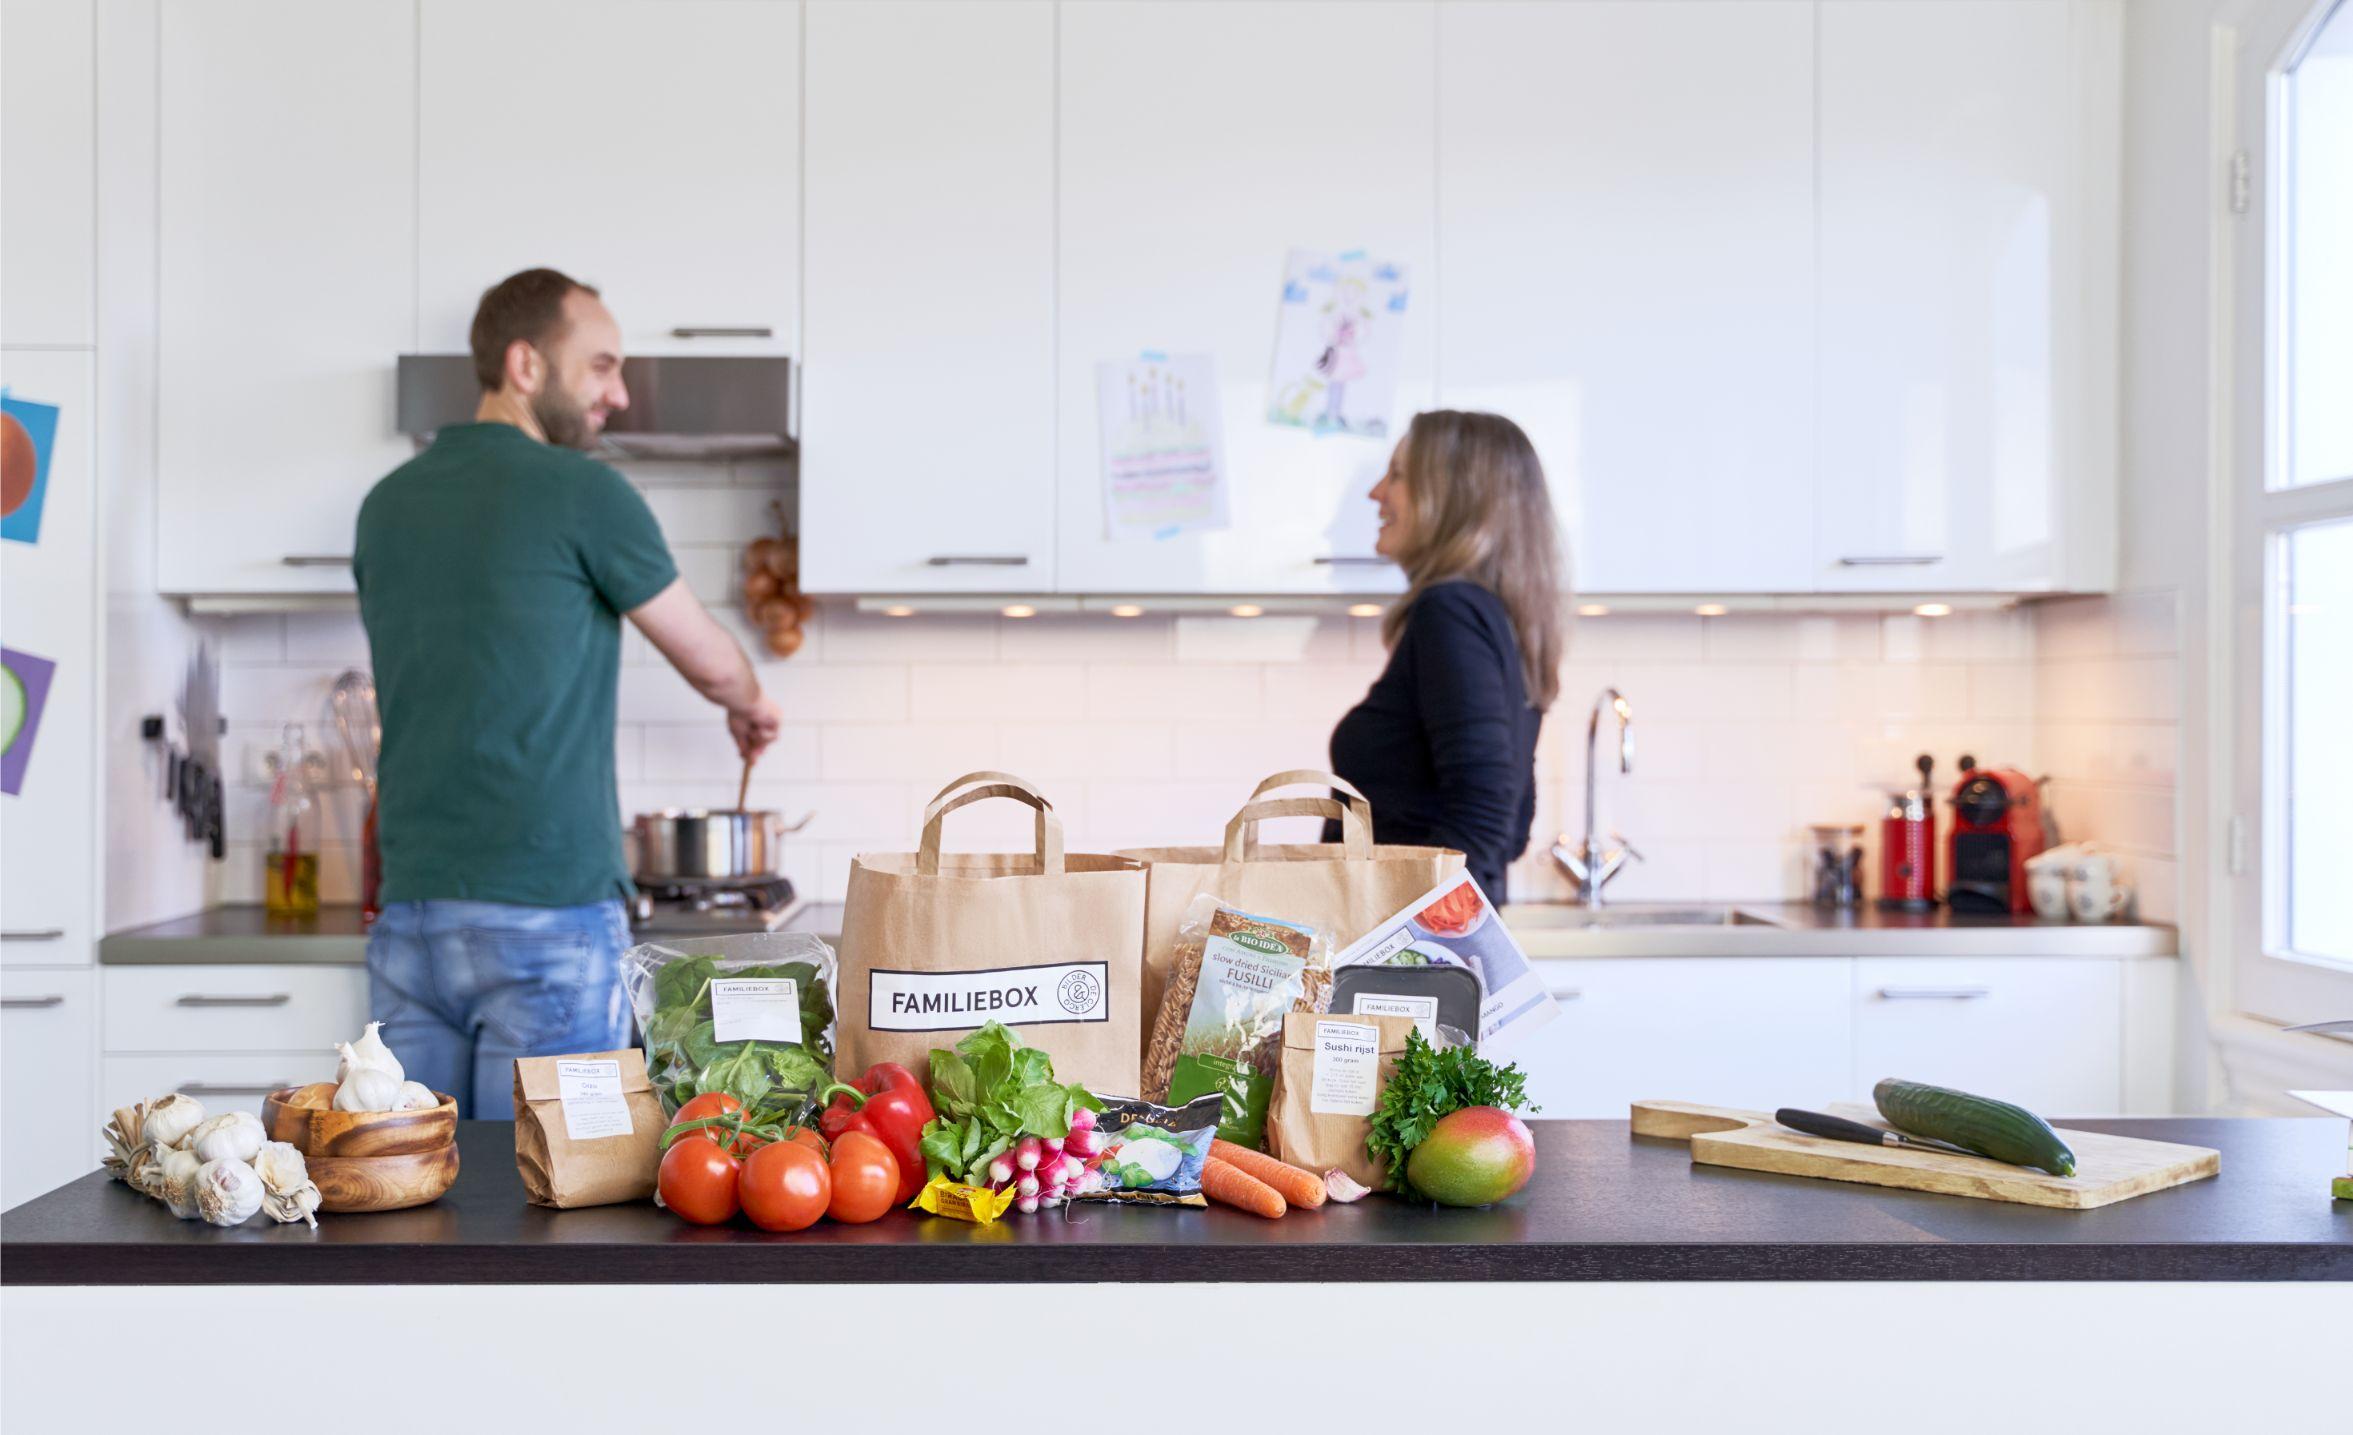 Familiebox Keuken